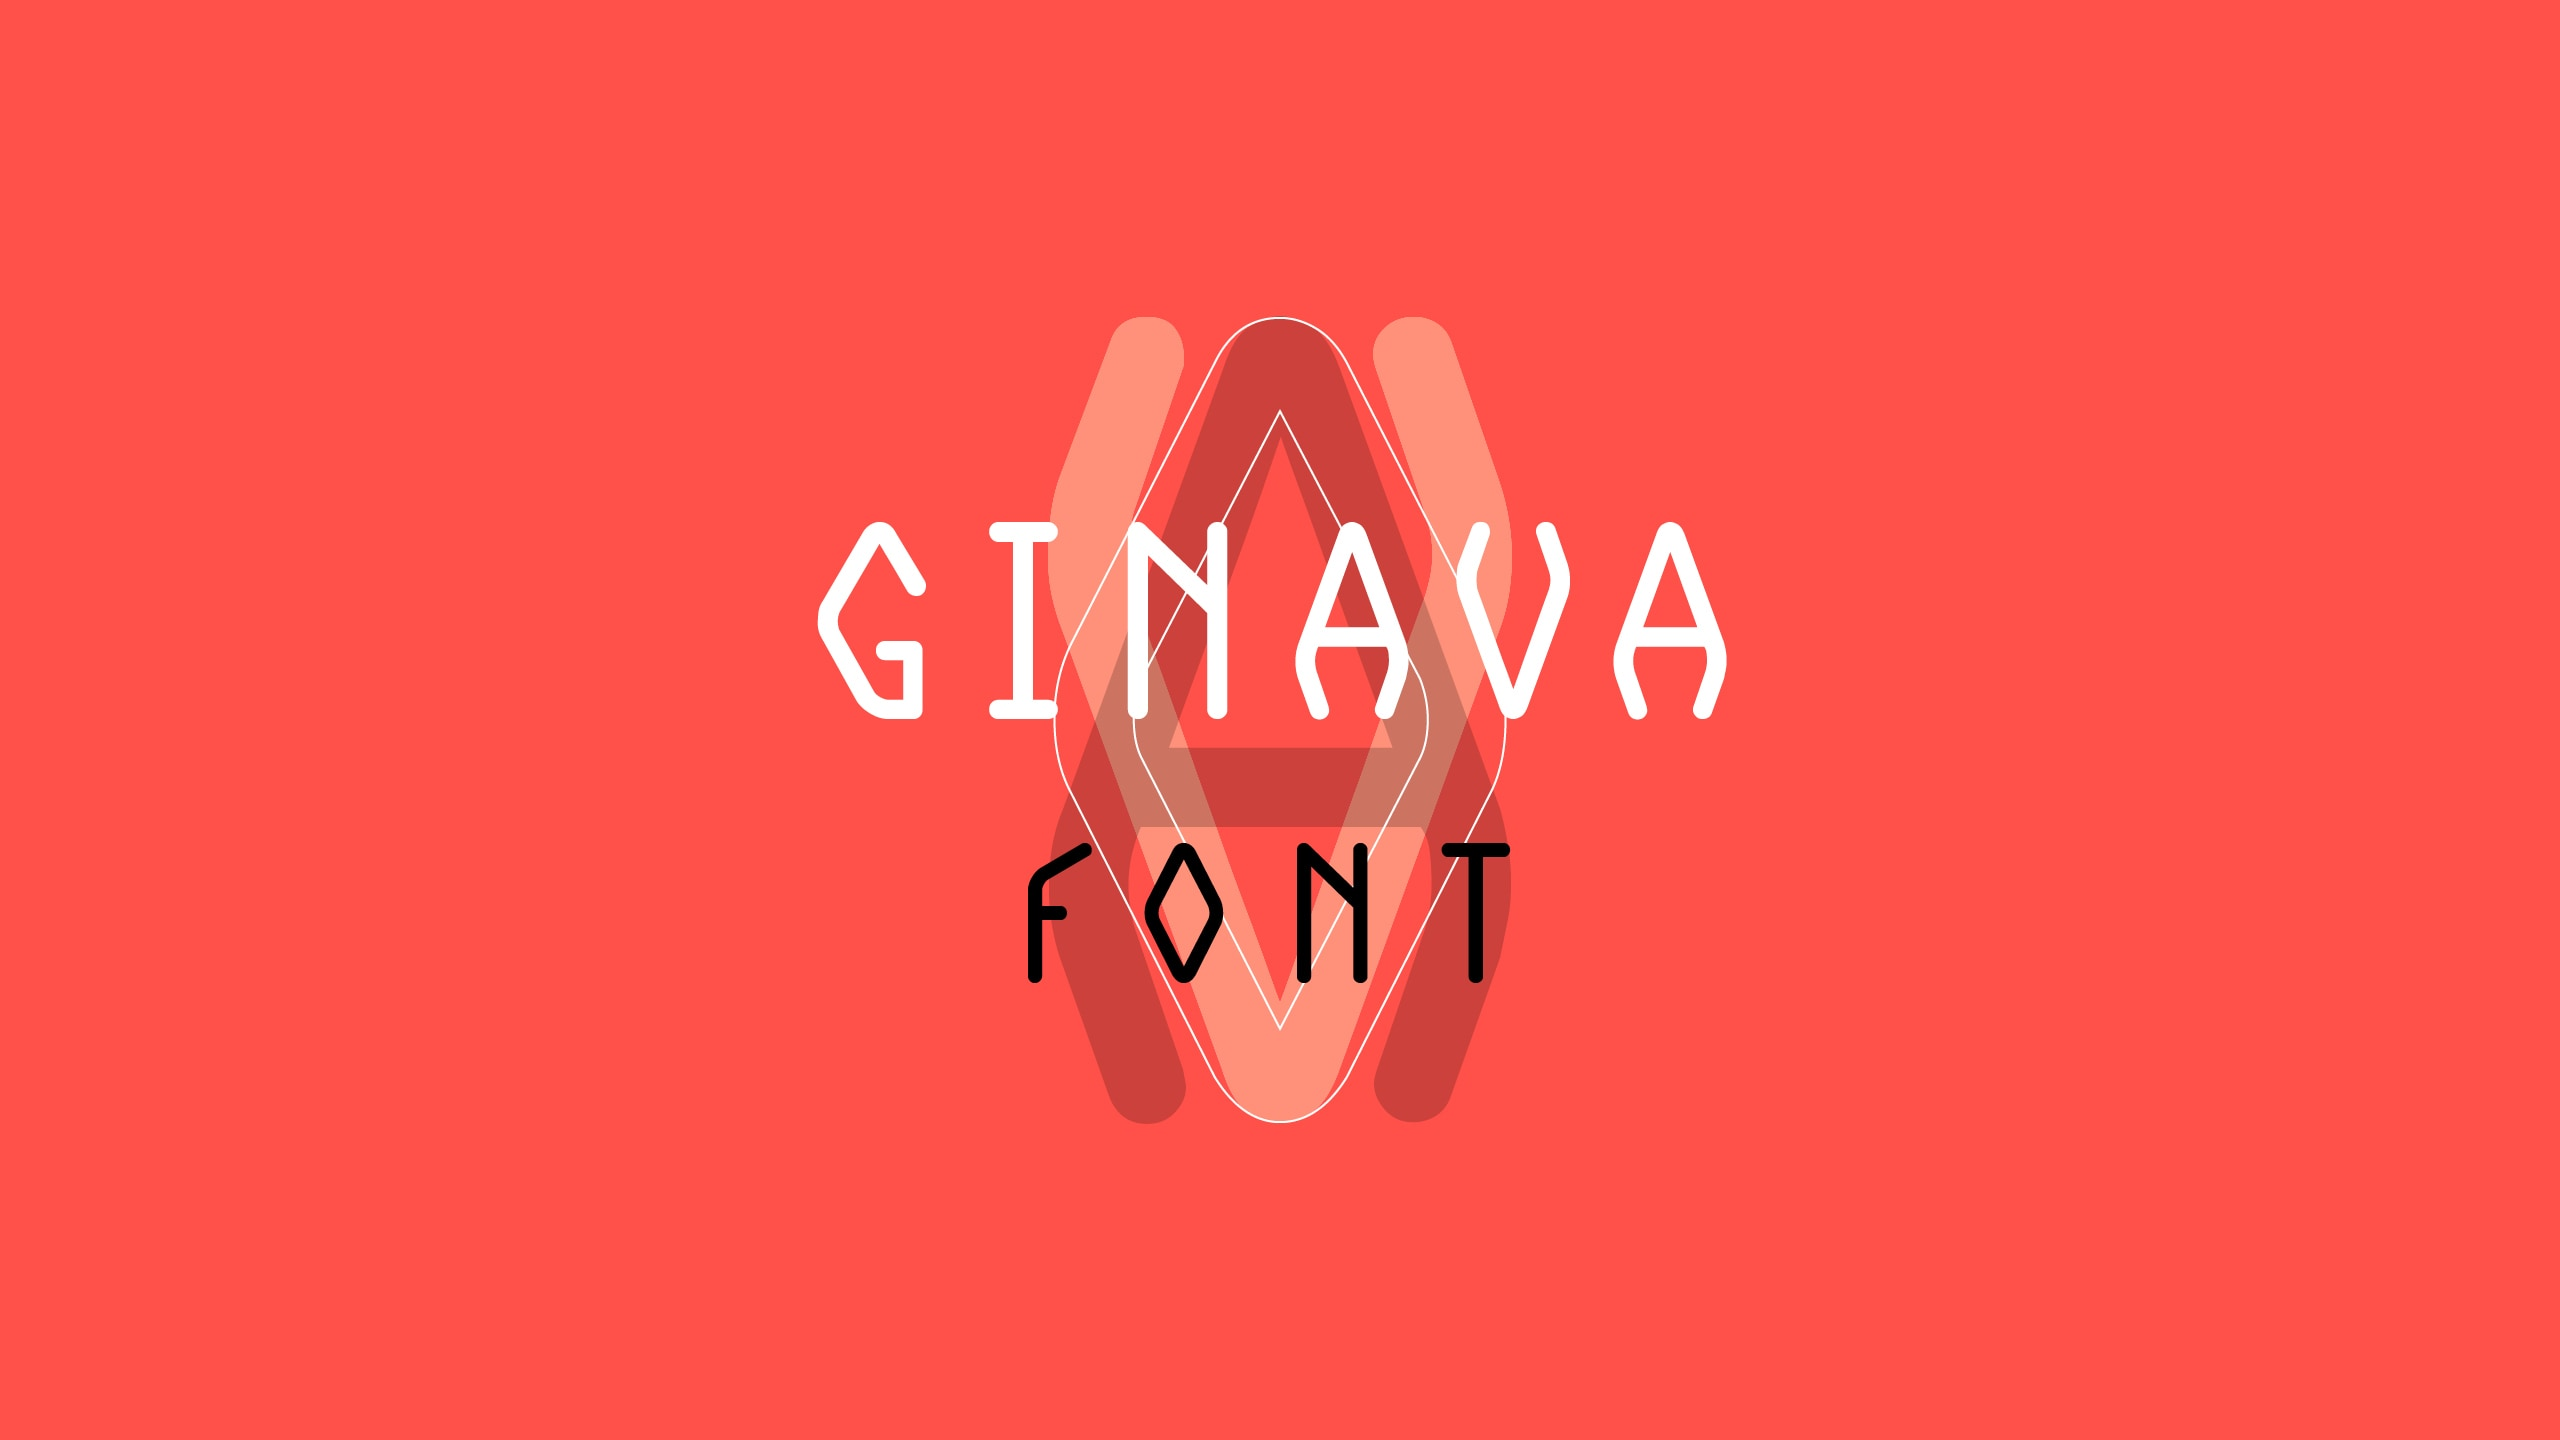 Ginava_1